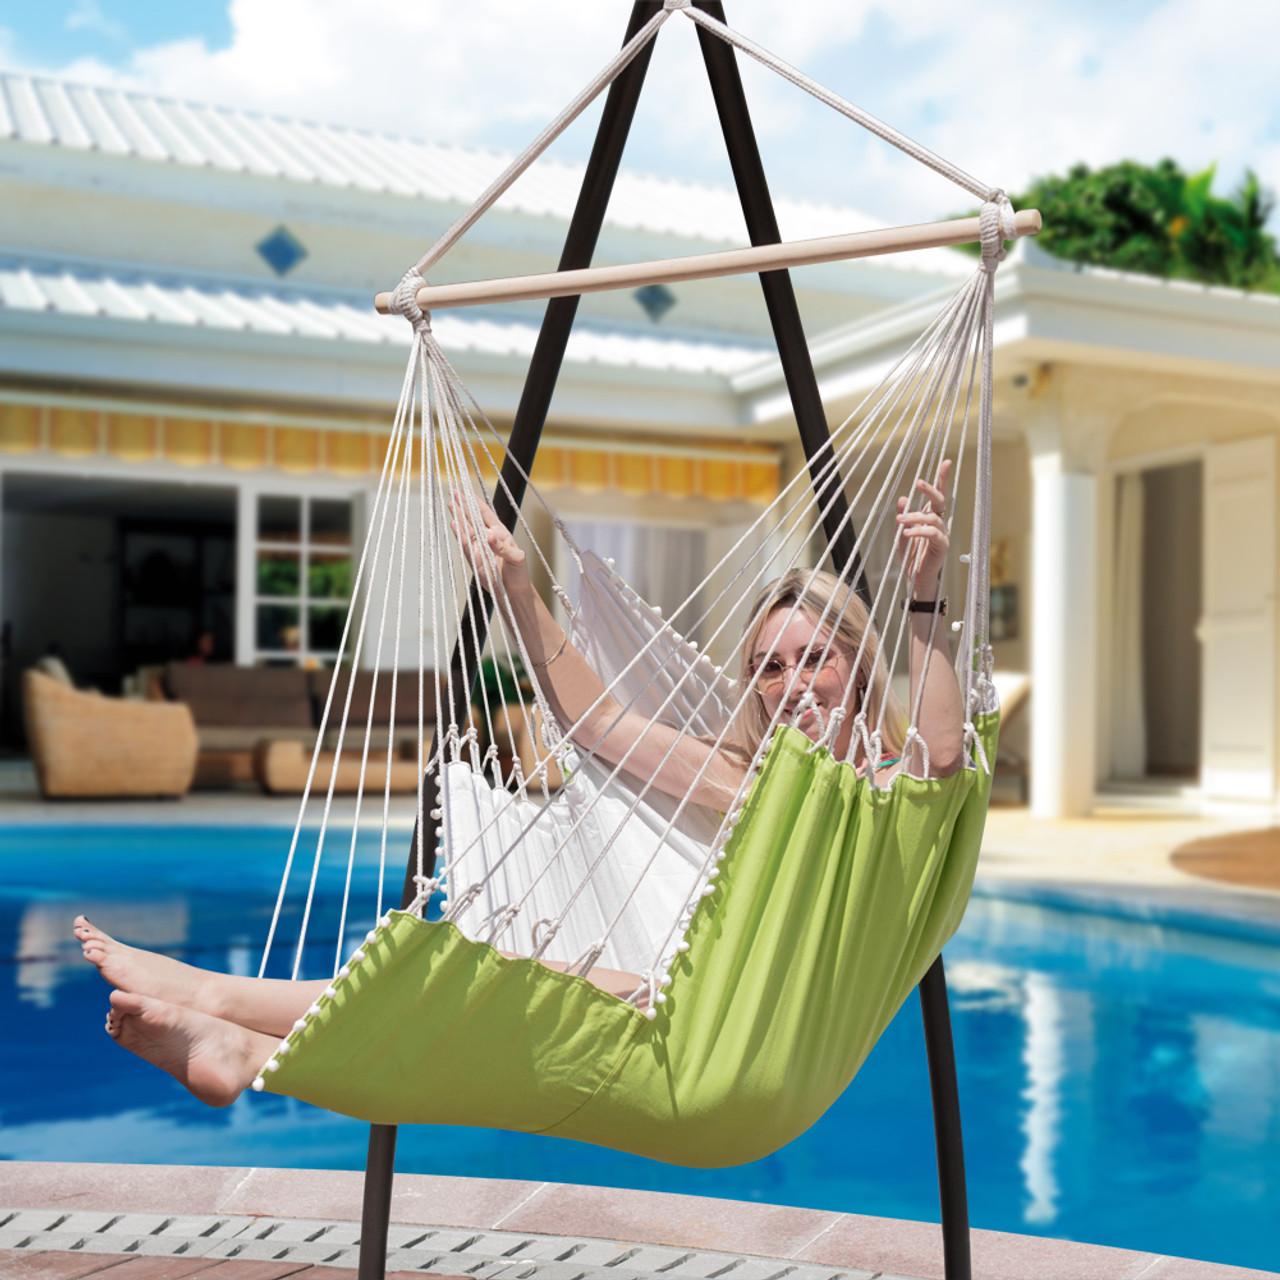 lazy daze hammocks large hanging hammock swing lounger chair seat with footrest and 2 throw pillows hanging air chair with pillow footrest drink holder  black   rh   sundaleoutdoor